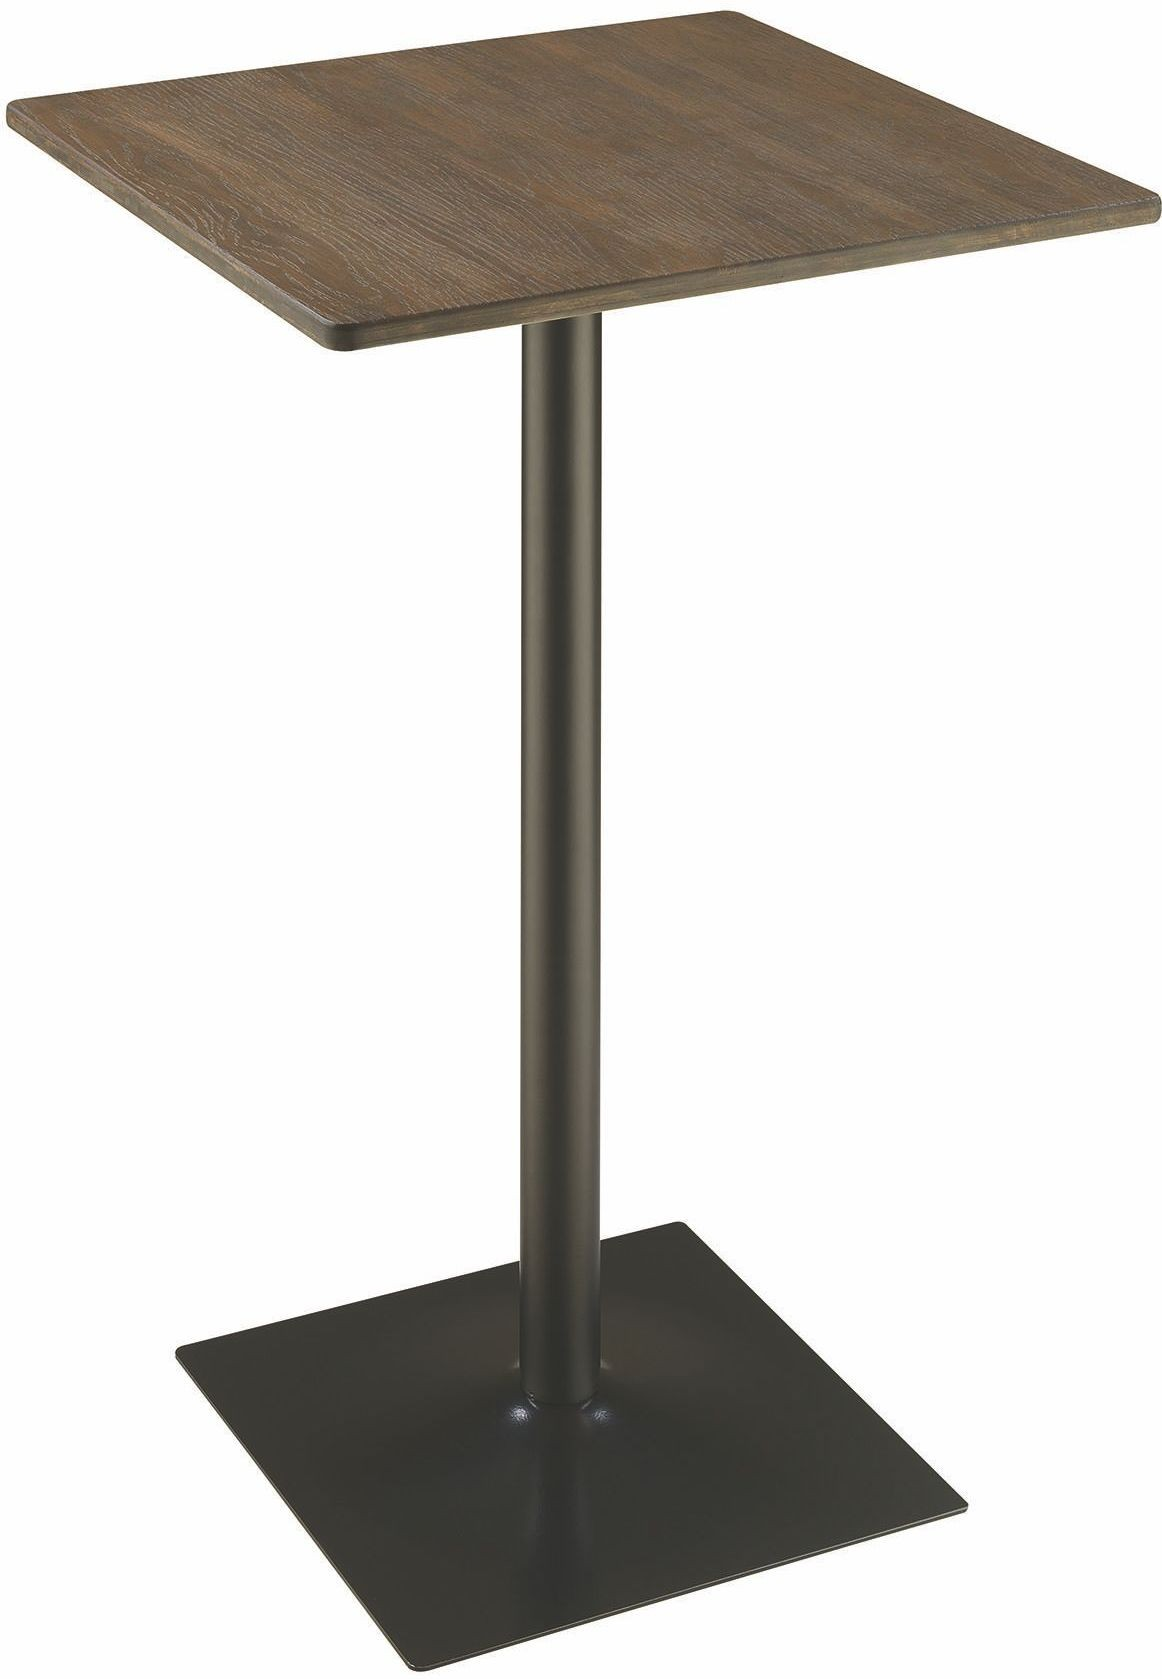 black square pub table and chairs unconventional chair design rec room dark elm matte bar 100730